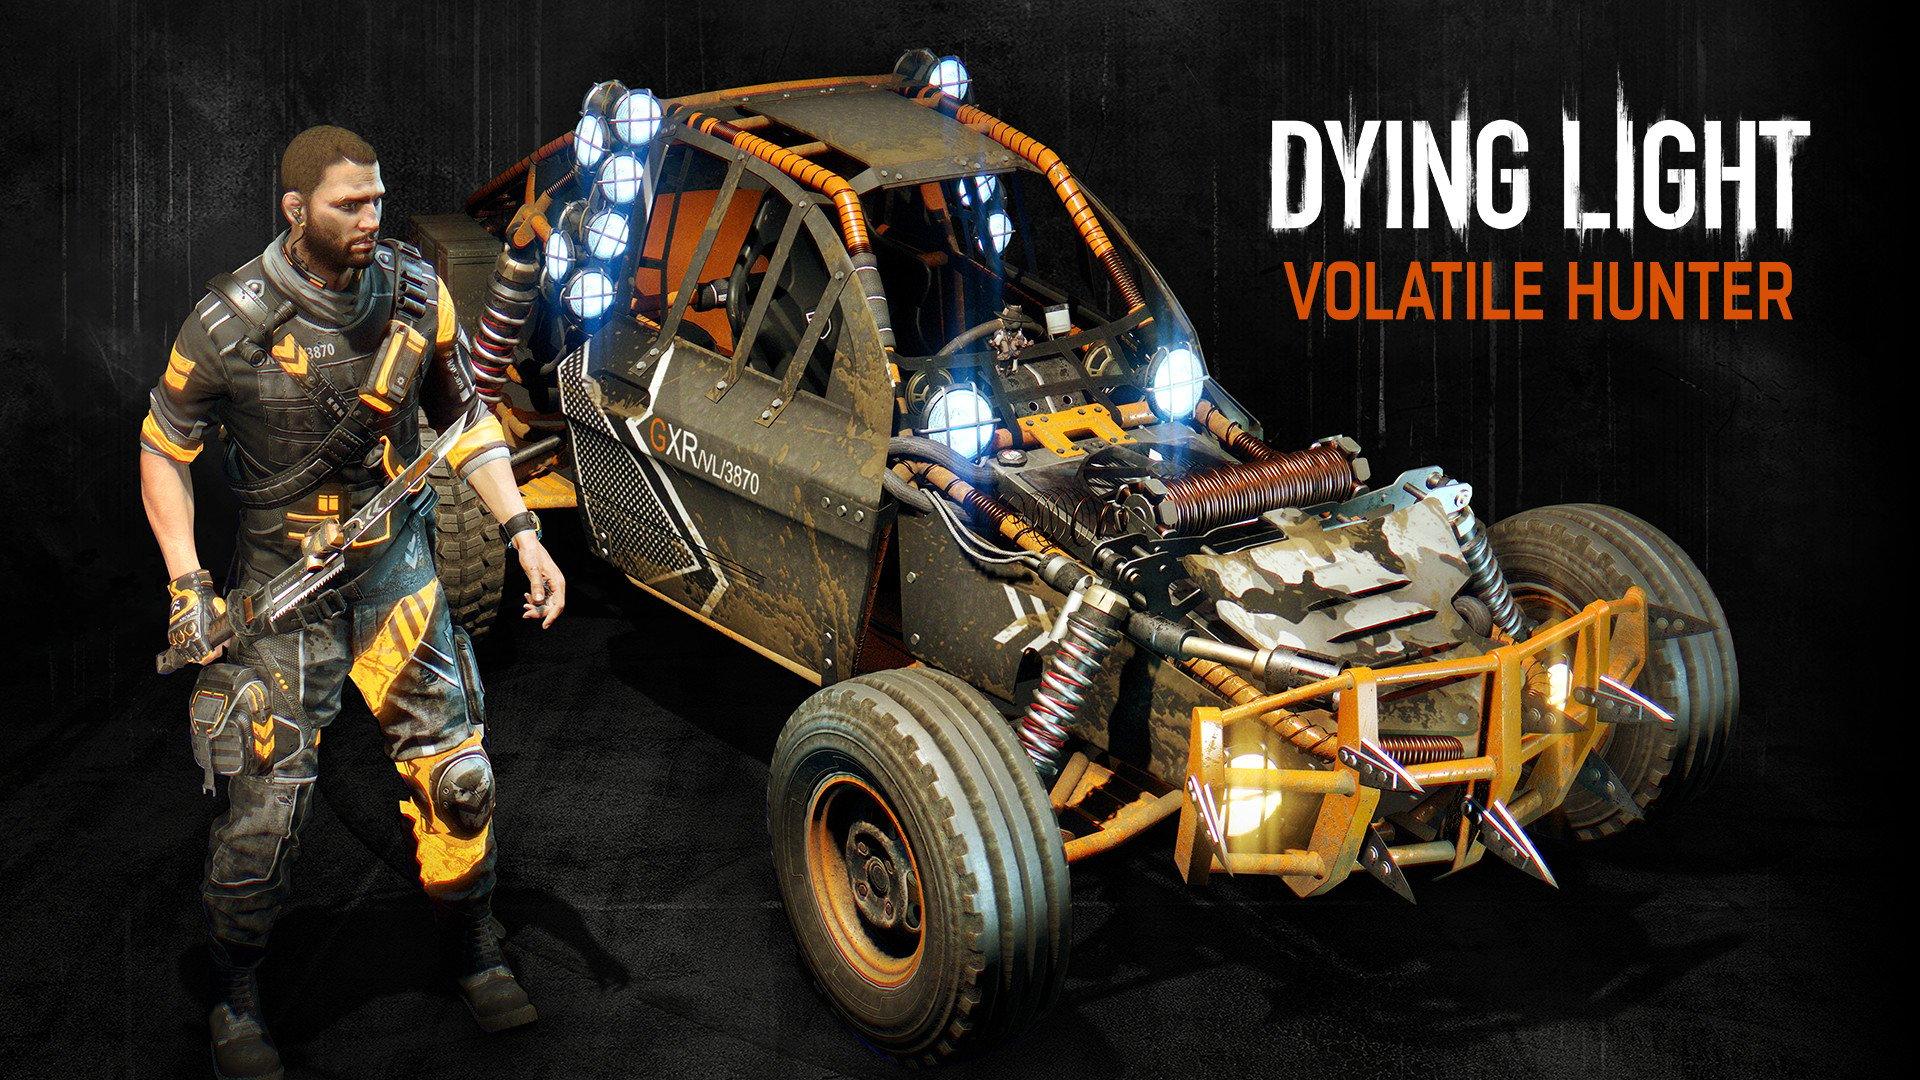 Dying Light - Volatile Hunter Bundle game image